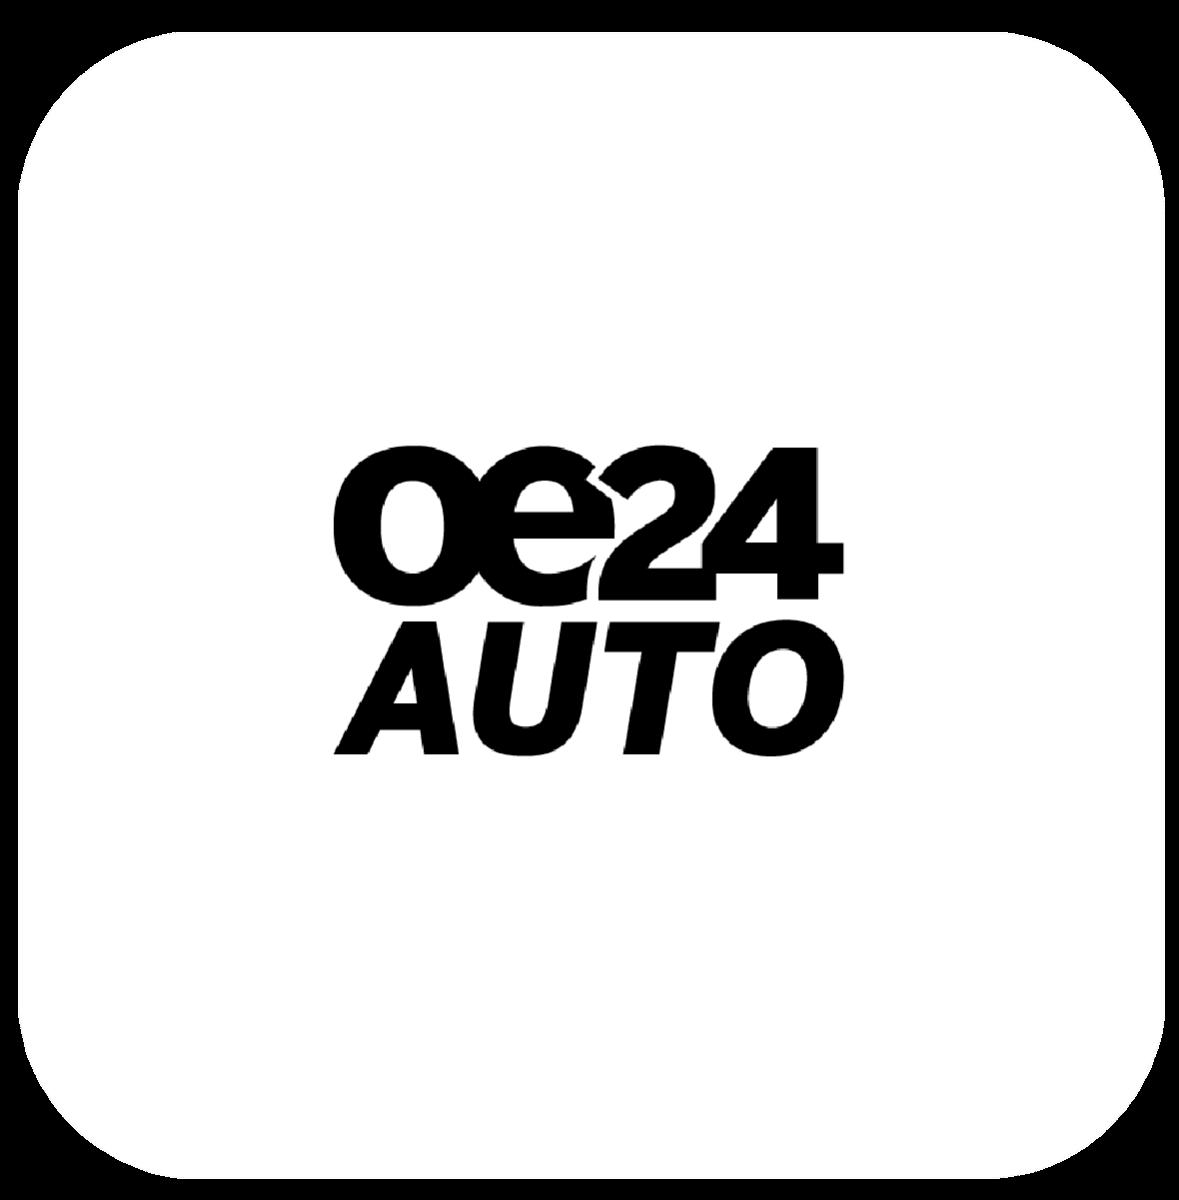 Oe24 Auto - Presseartikel - BMW und MINI im Abo.